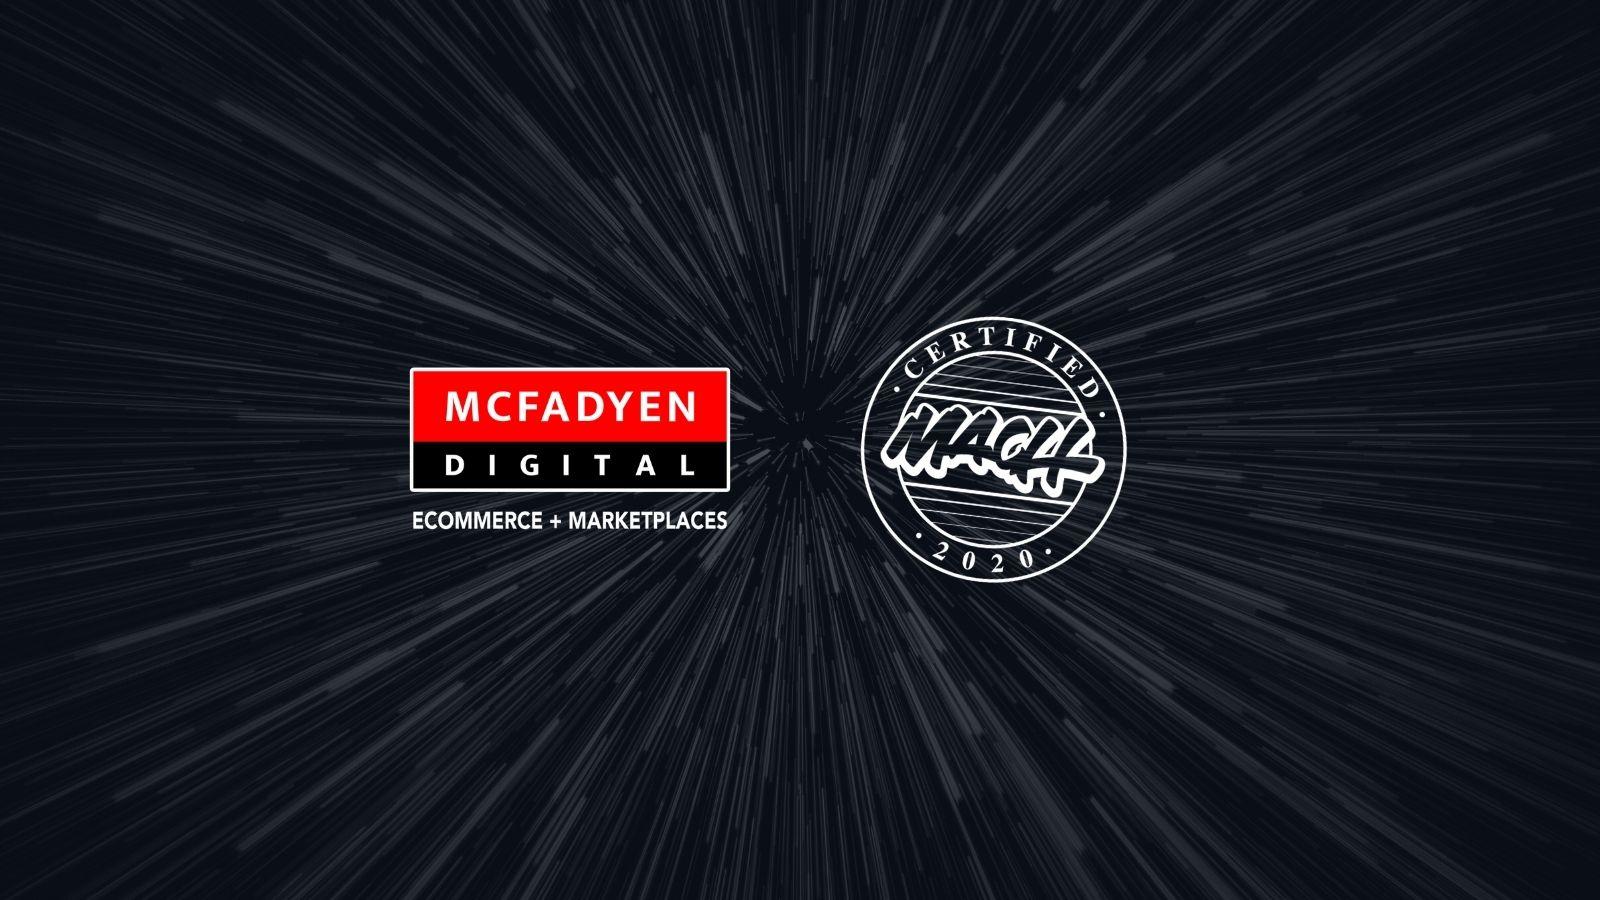 McFadyen entra para a Mach ALliance